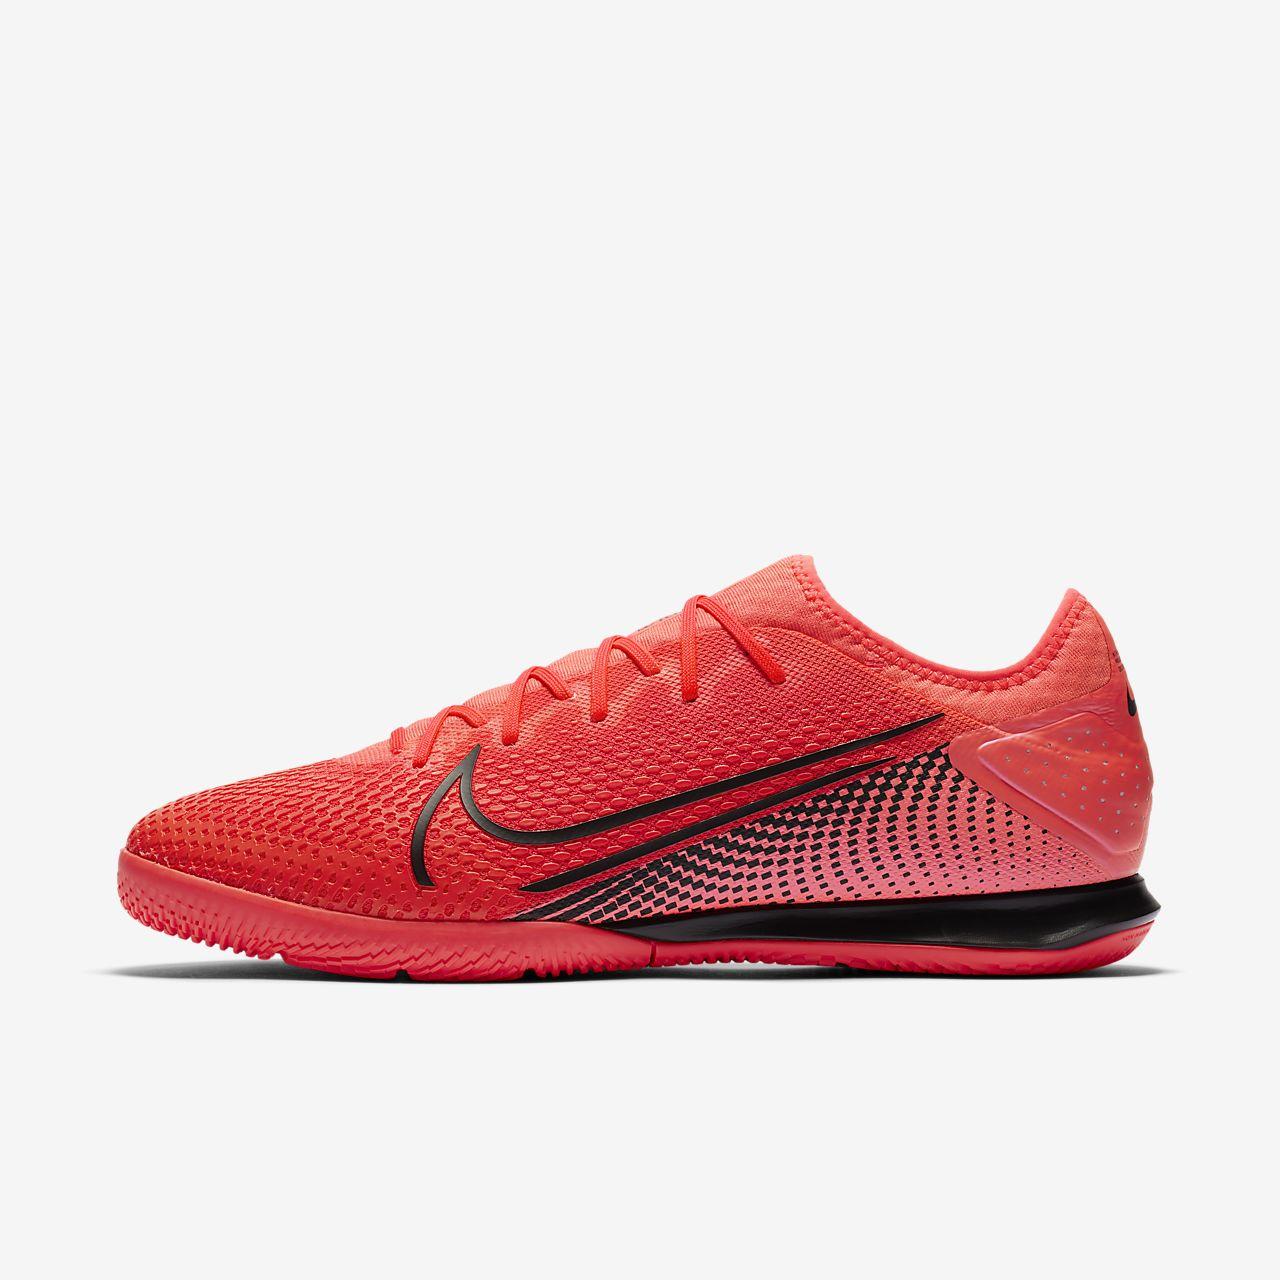 Chaussure de football en salle Nike Mercurial Vapor 13 Pro IC